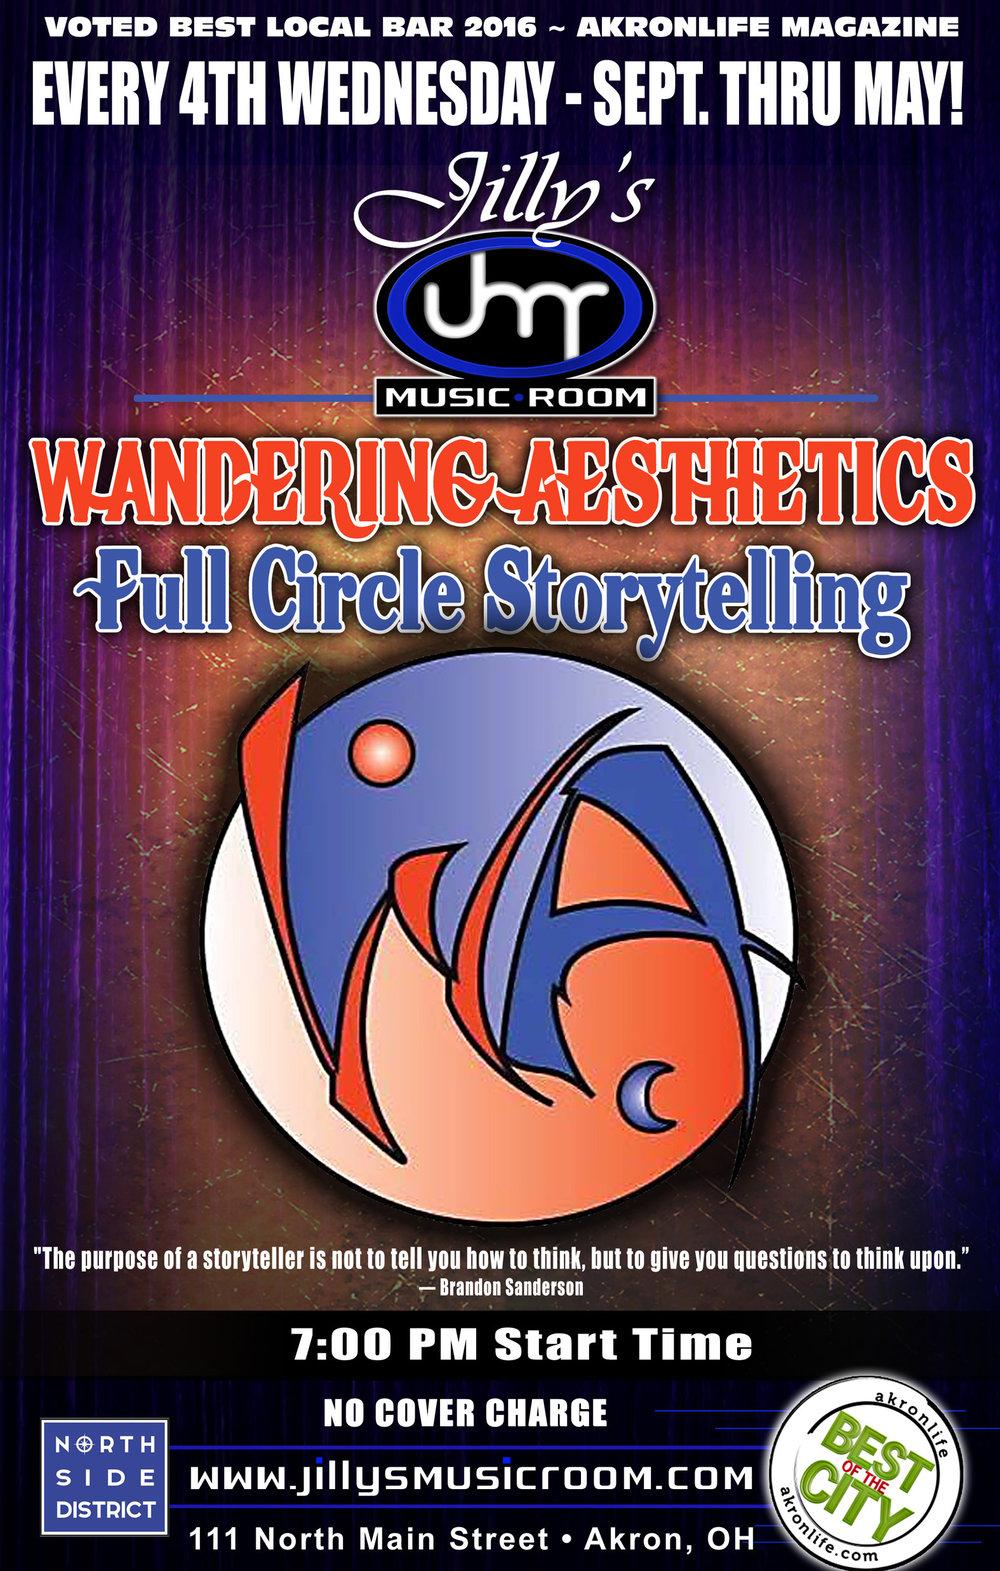 JMR - Wandering Aesthetics Monthly Poster 1-1.jpg